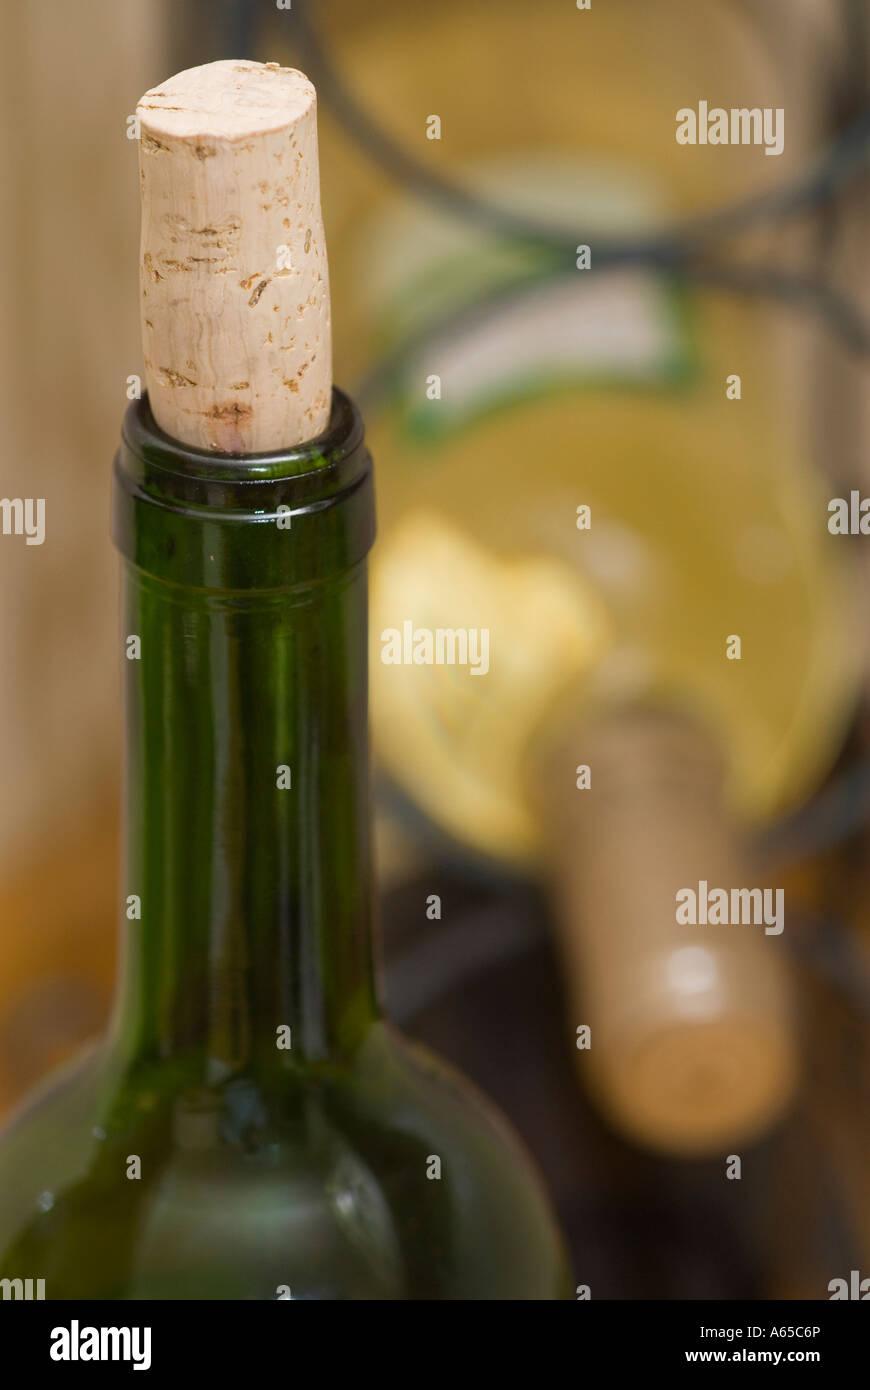 Opened Wine Bottle Cork Put Stock Photos Opened Wine Bottle Cork